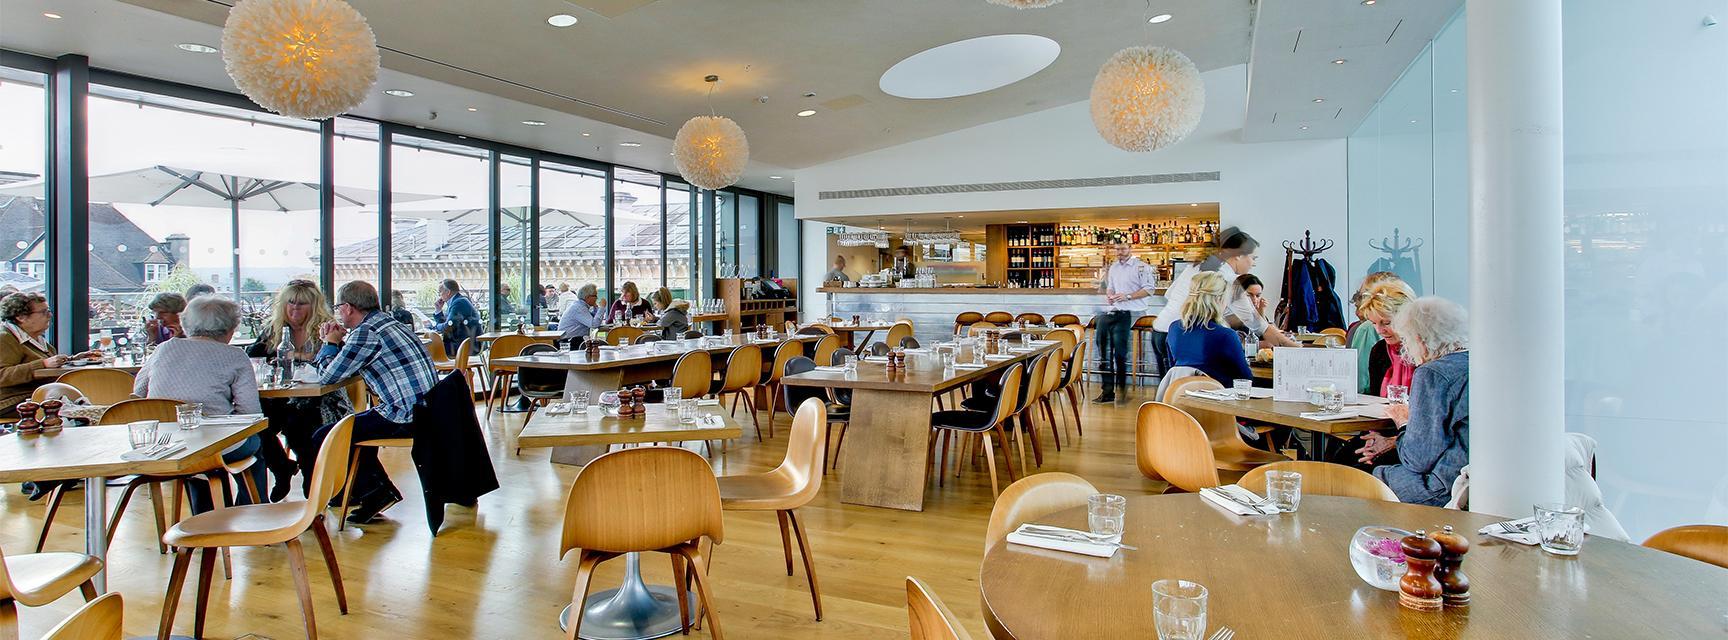 The Ashmolean Rooftop Restaurant BOOK RESTAURANT TABLE